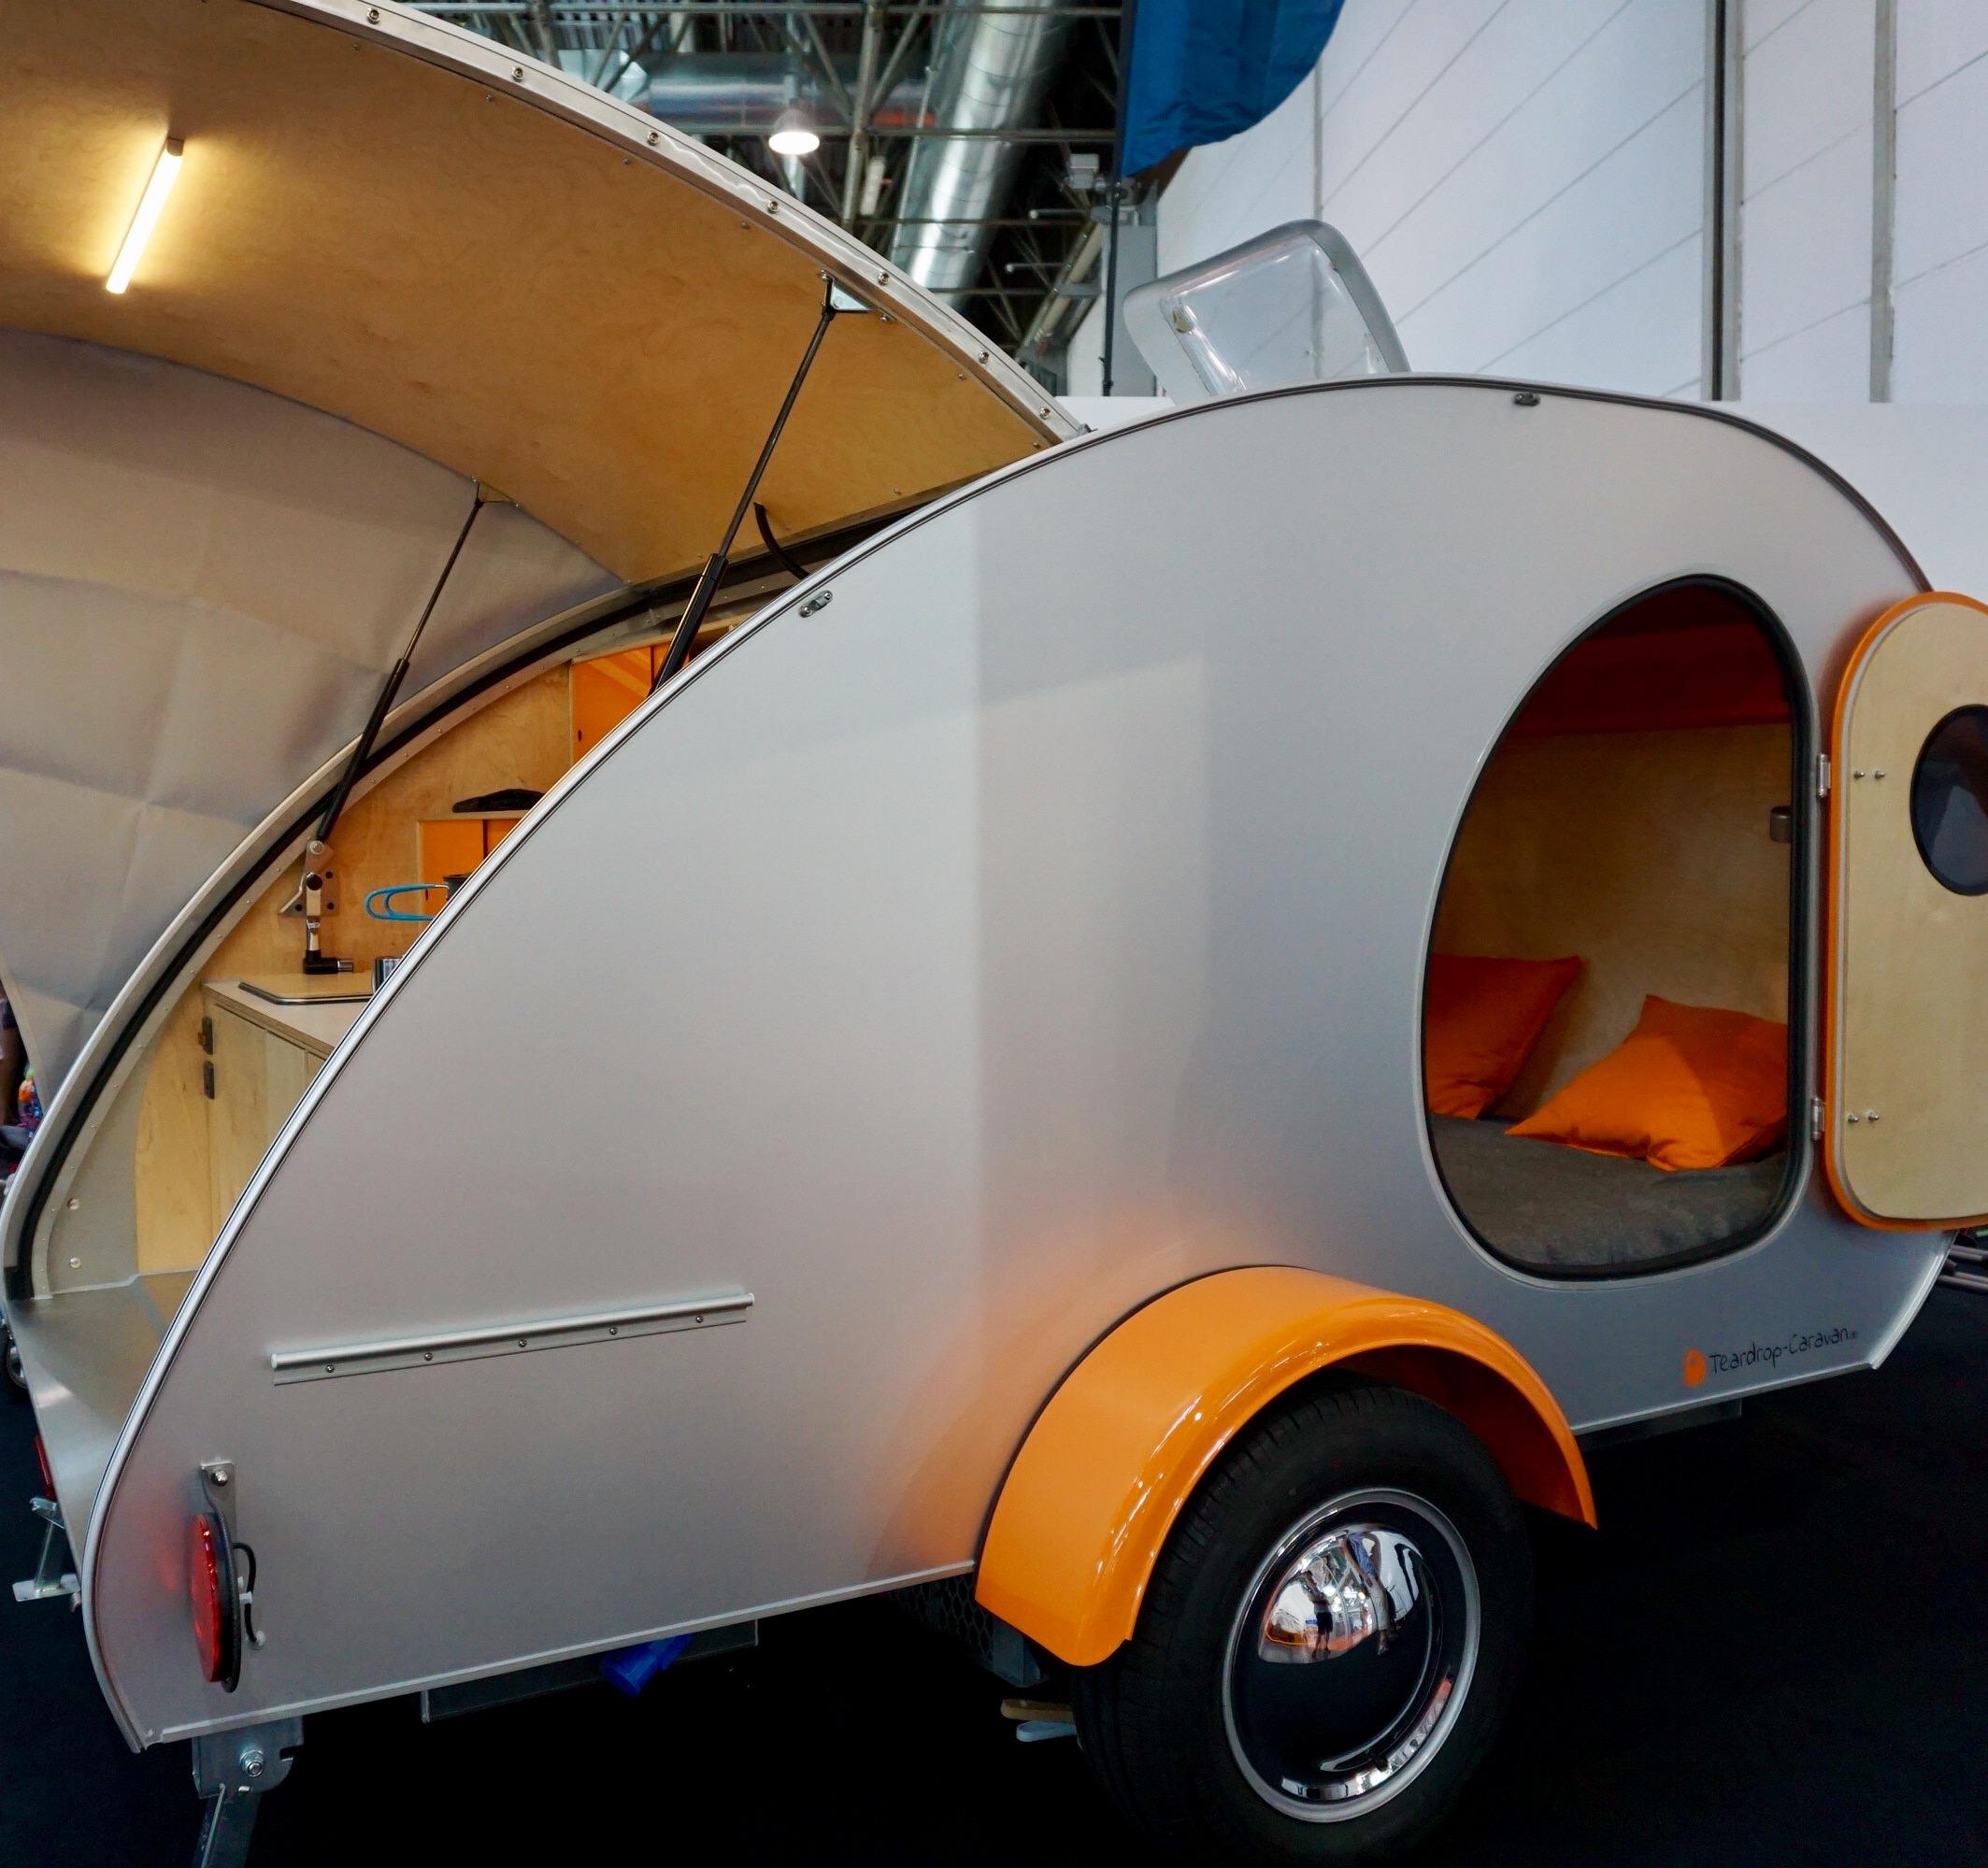 teardrops die mini wohnwagen wohn blogger